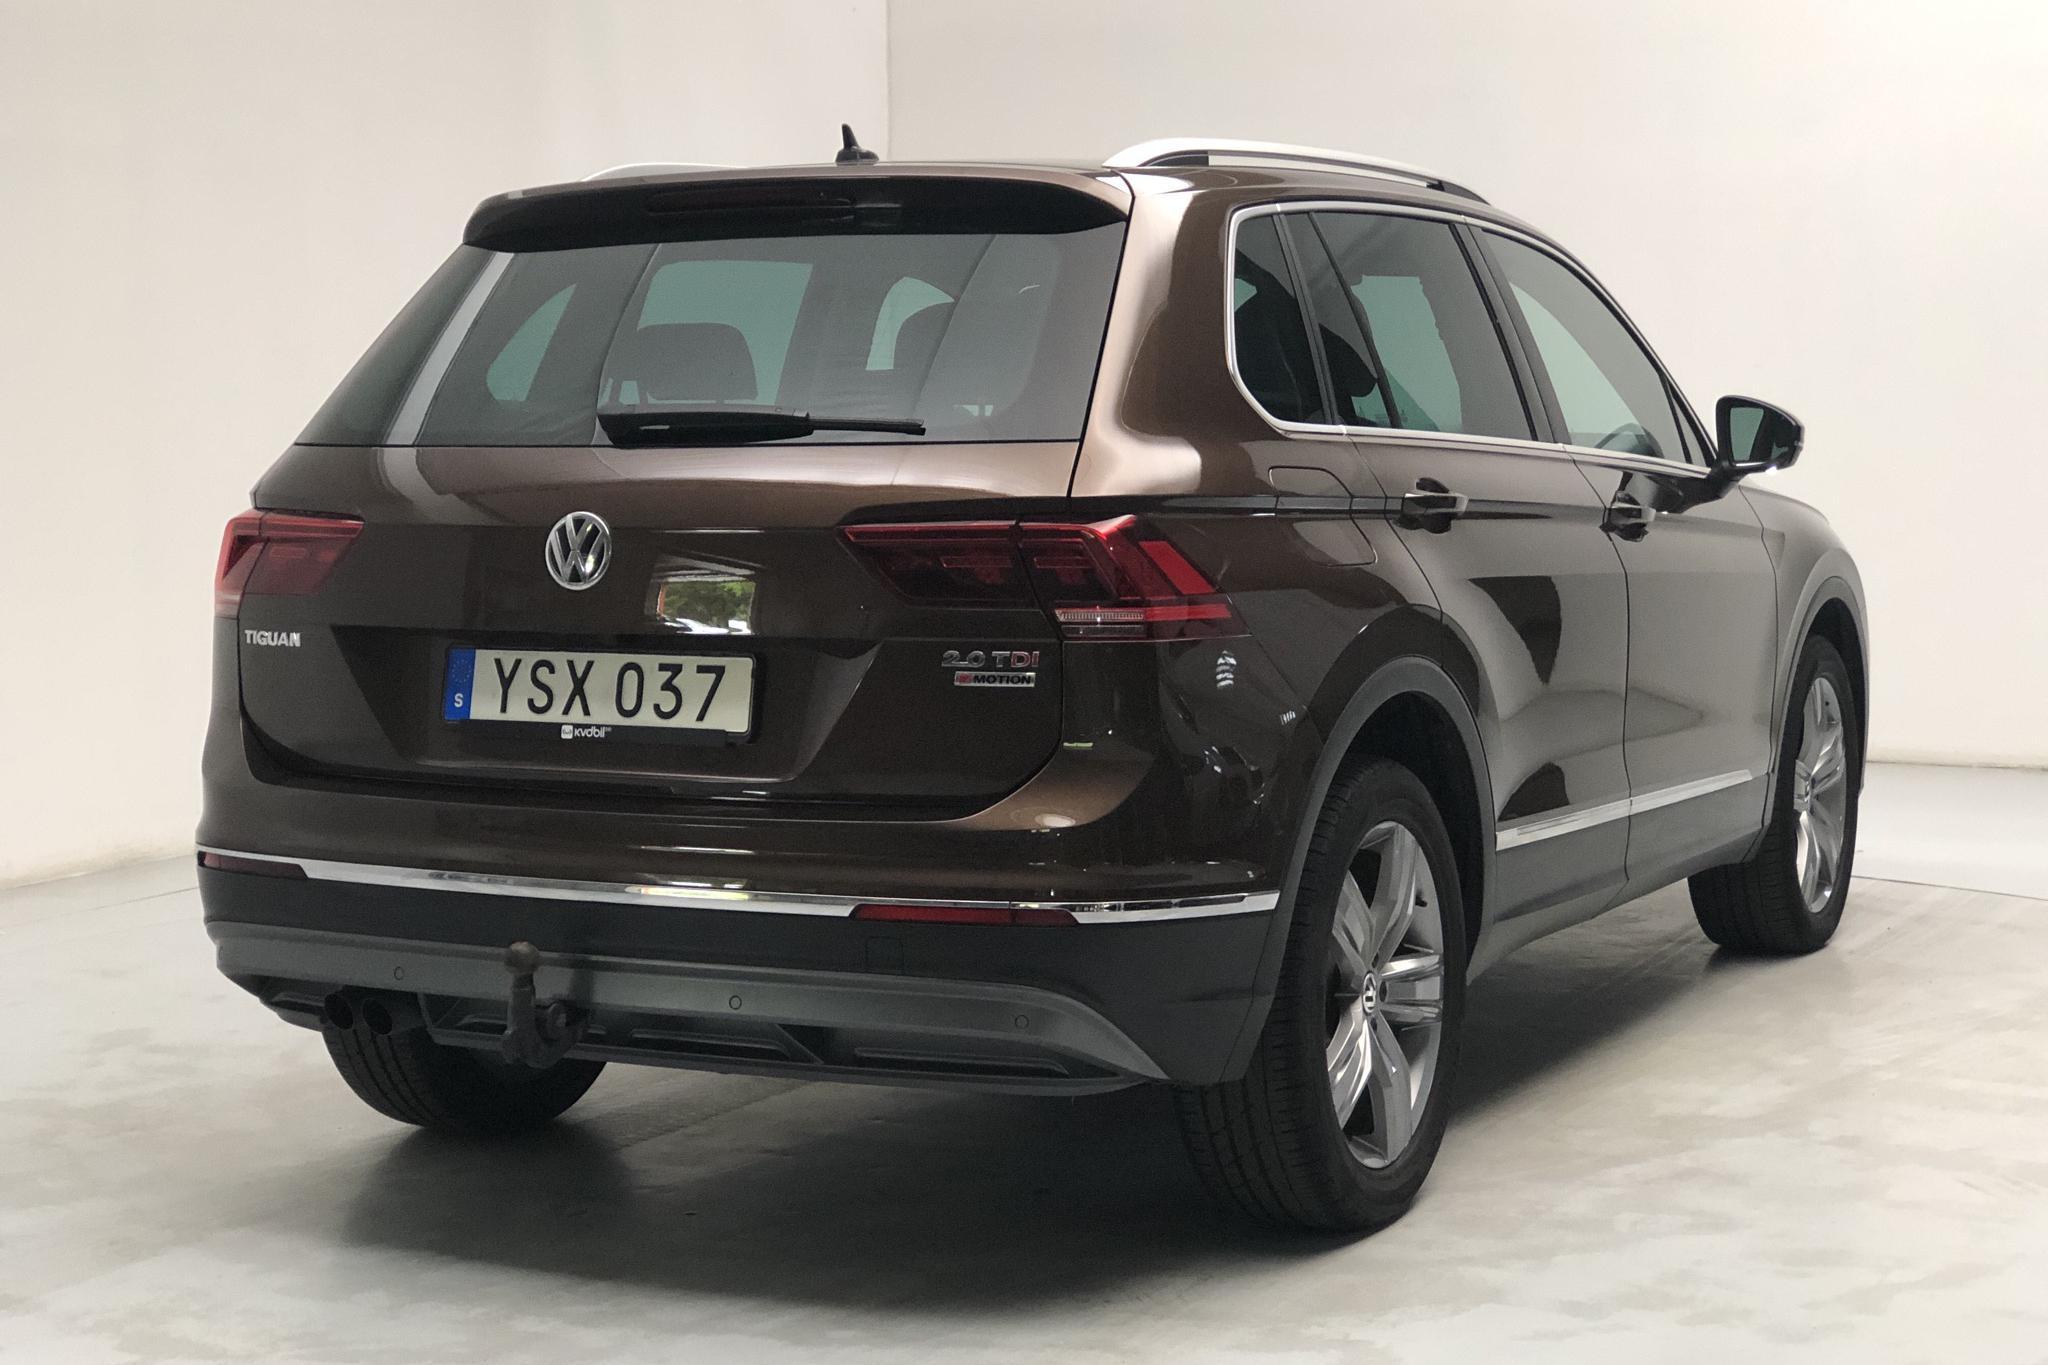 VW Tiguan GT 2.0 TDI 4MOTION (190hk) - 74 530 km - Automatic - Dark Brown - 2018